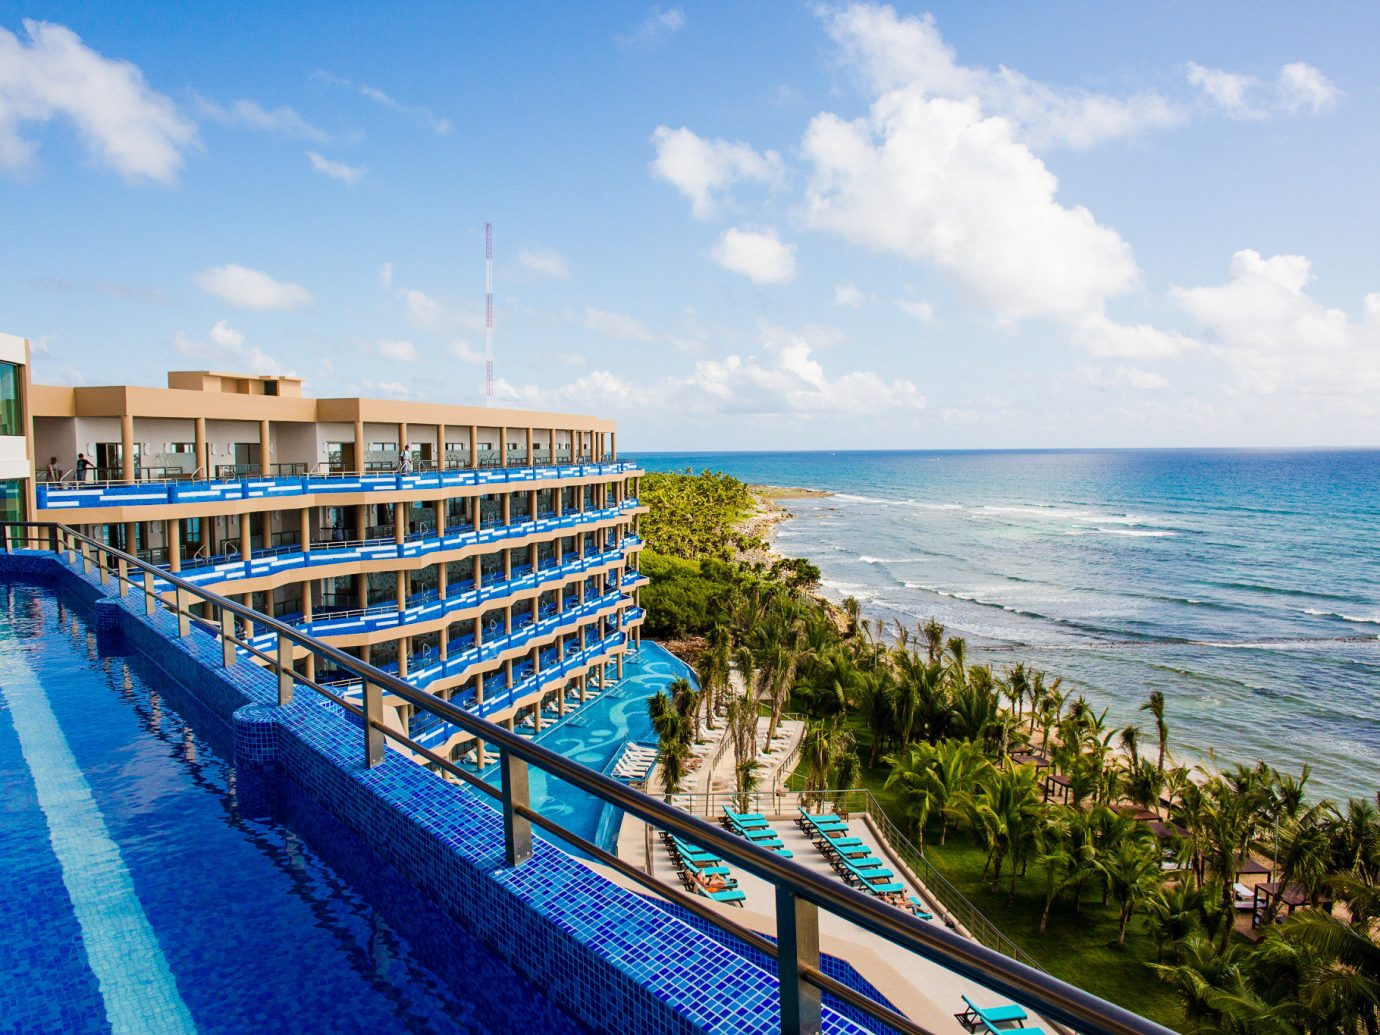 All-inclusive All-Inclusive Resorts Mexico Riviera Maya, Mexico Sea Resort sky condominium leisure vacation Coast Ocean shore real estate tourism swimming pool horizon resort town water bay Beach